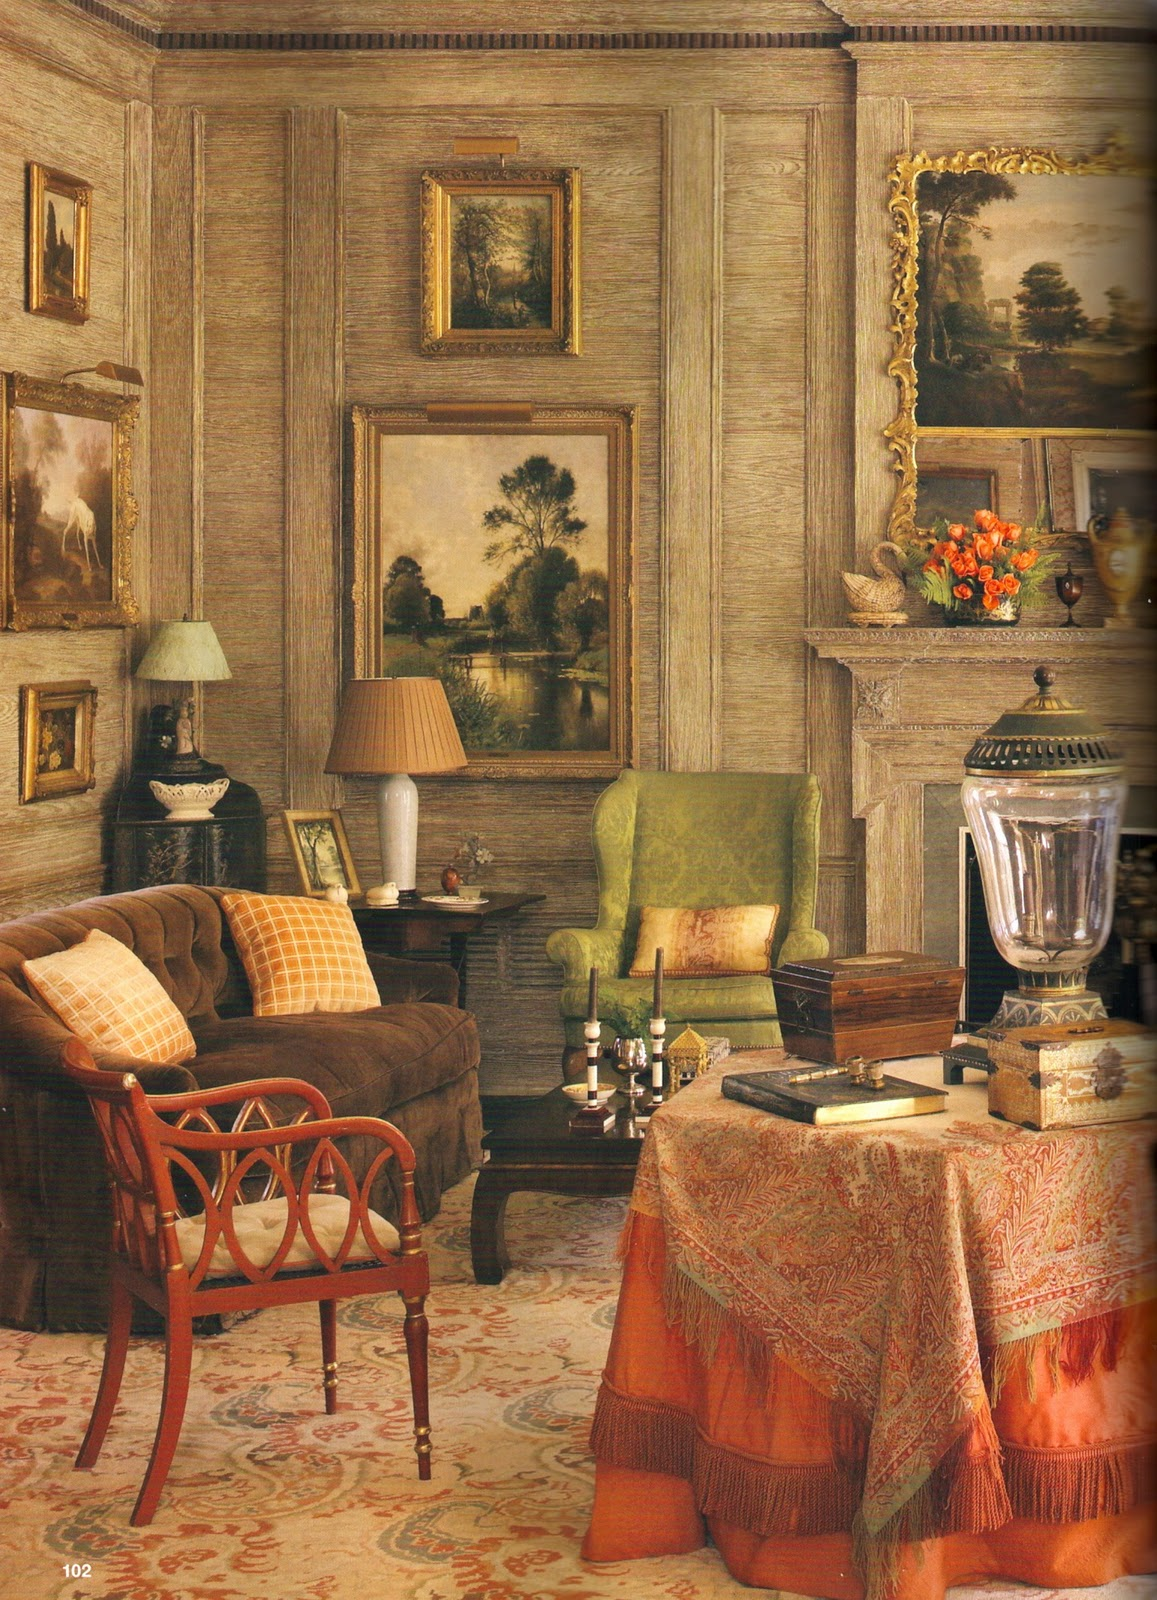 Splendid Sass Richard Keith Langham And Lewis Graeber Design In Mississippi